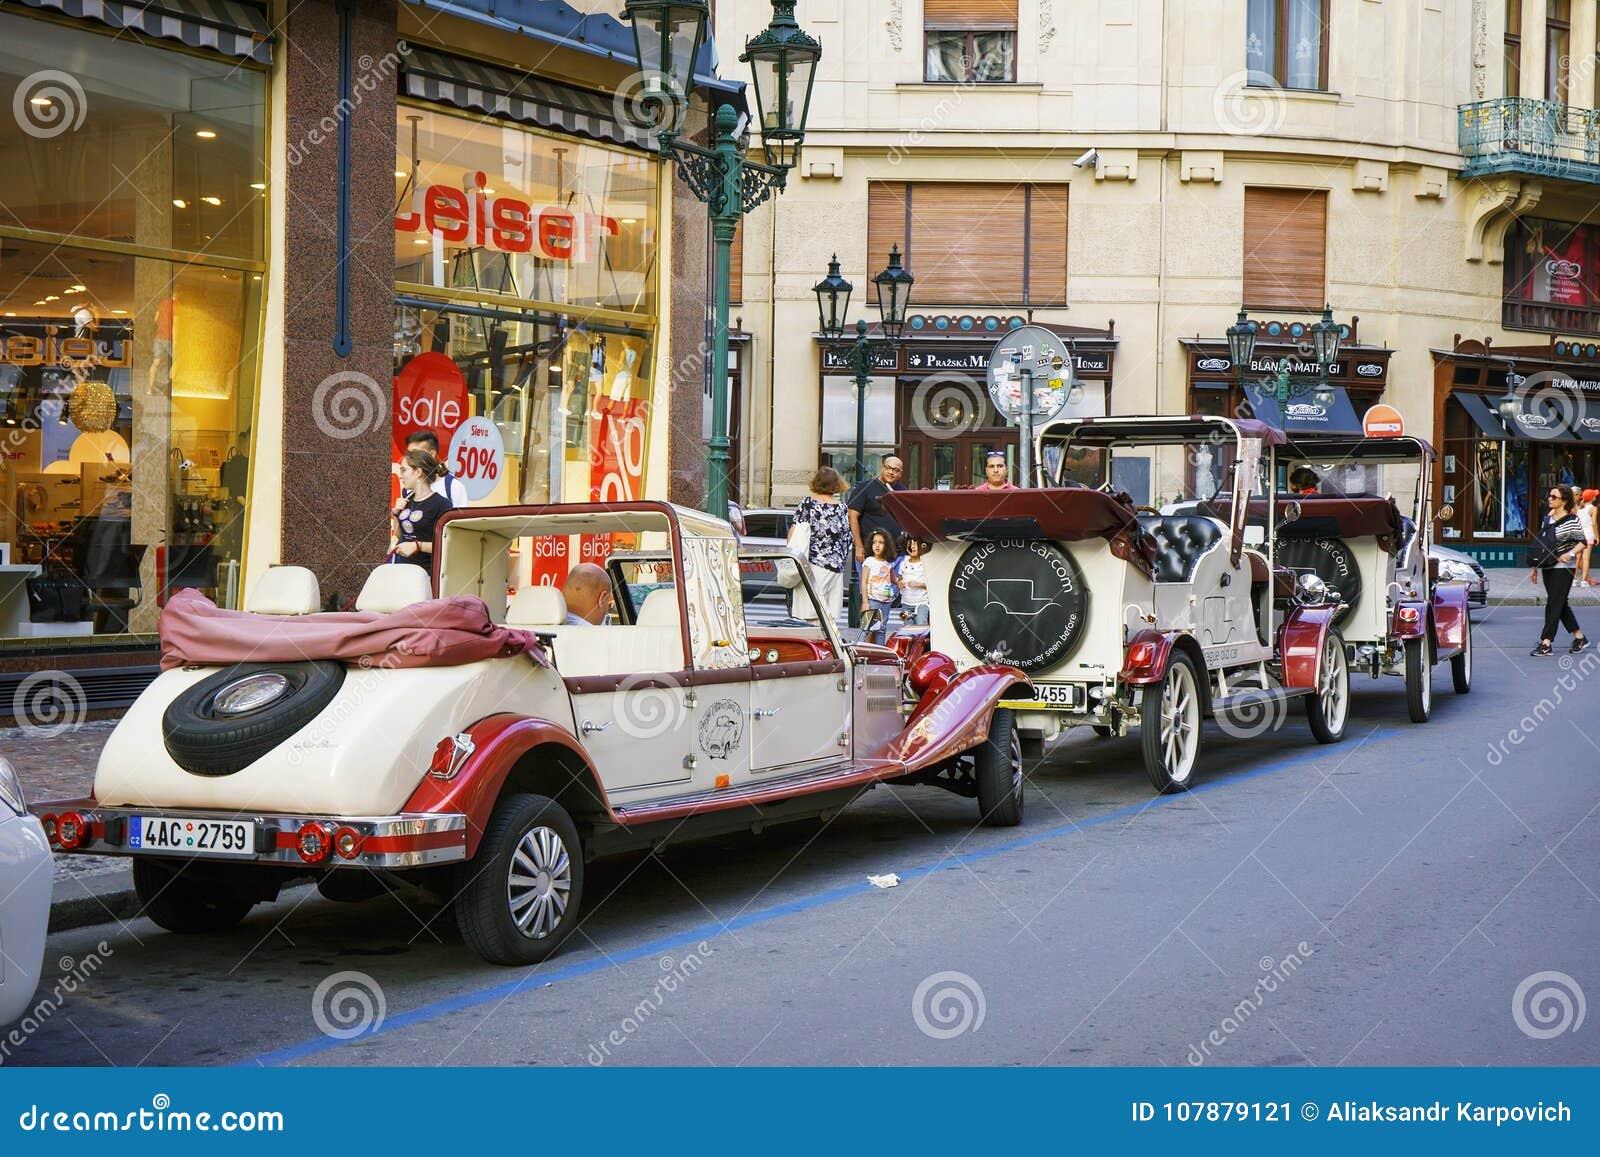 República Checa de Praga 2 de agosto 2017: coches retros rodantes en las calles de Praga